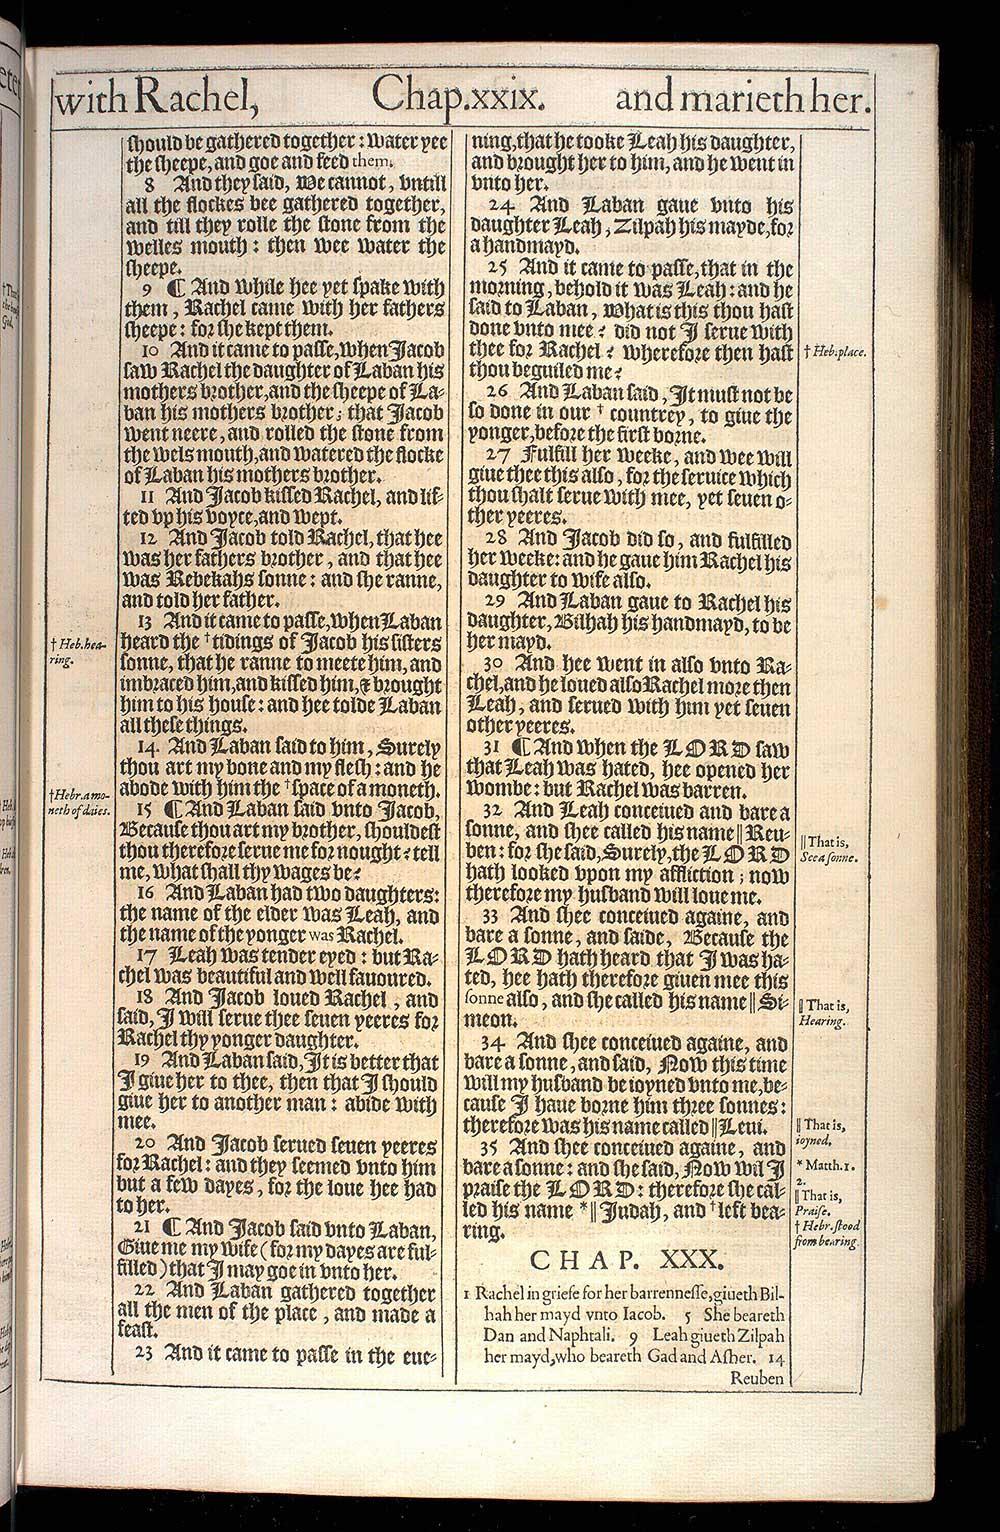 Genesis Chapter 29 Original 1611 Bible Scan